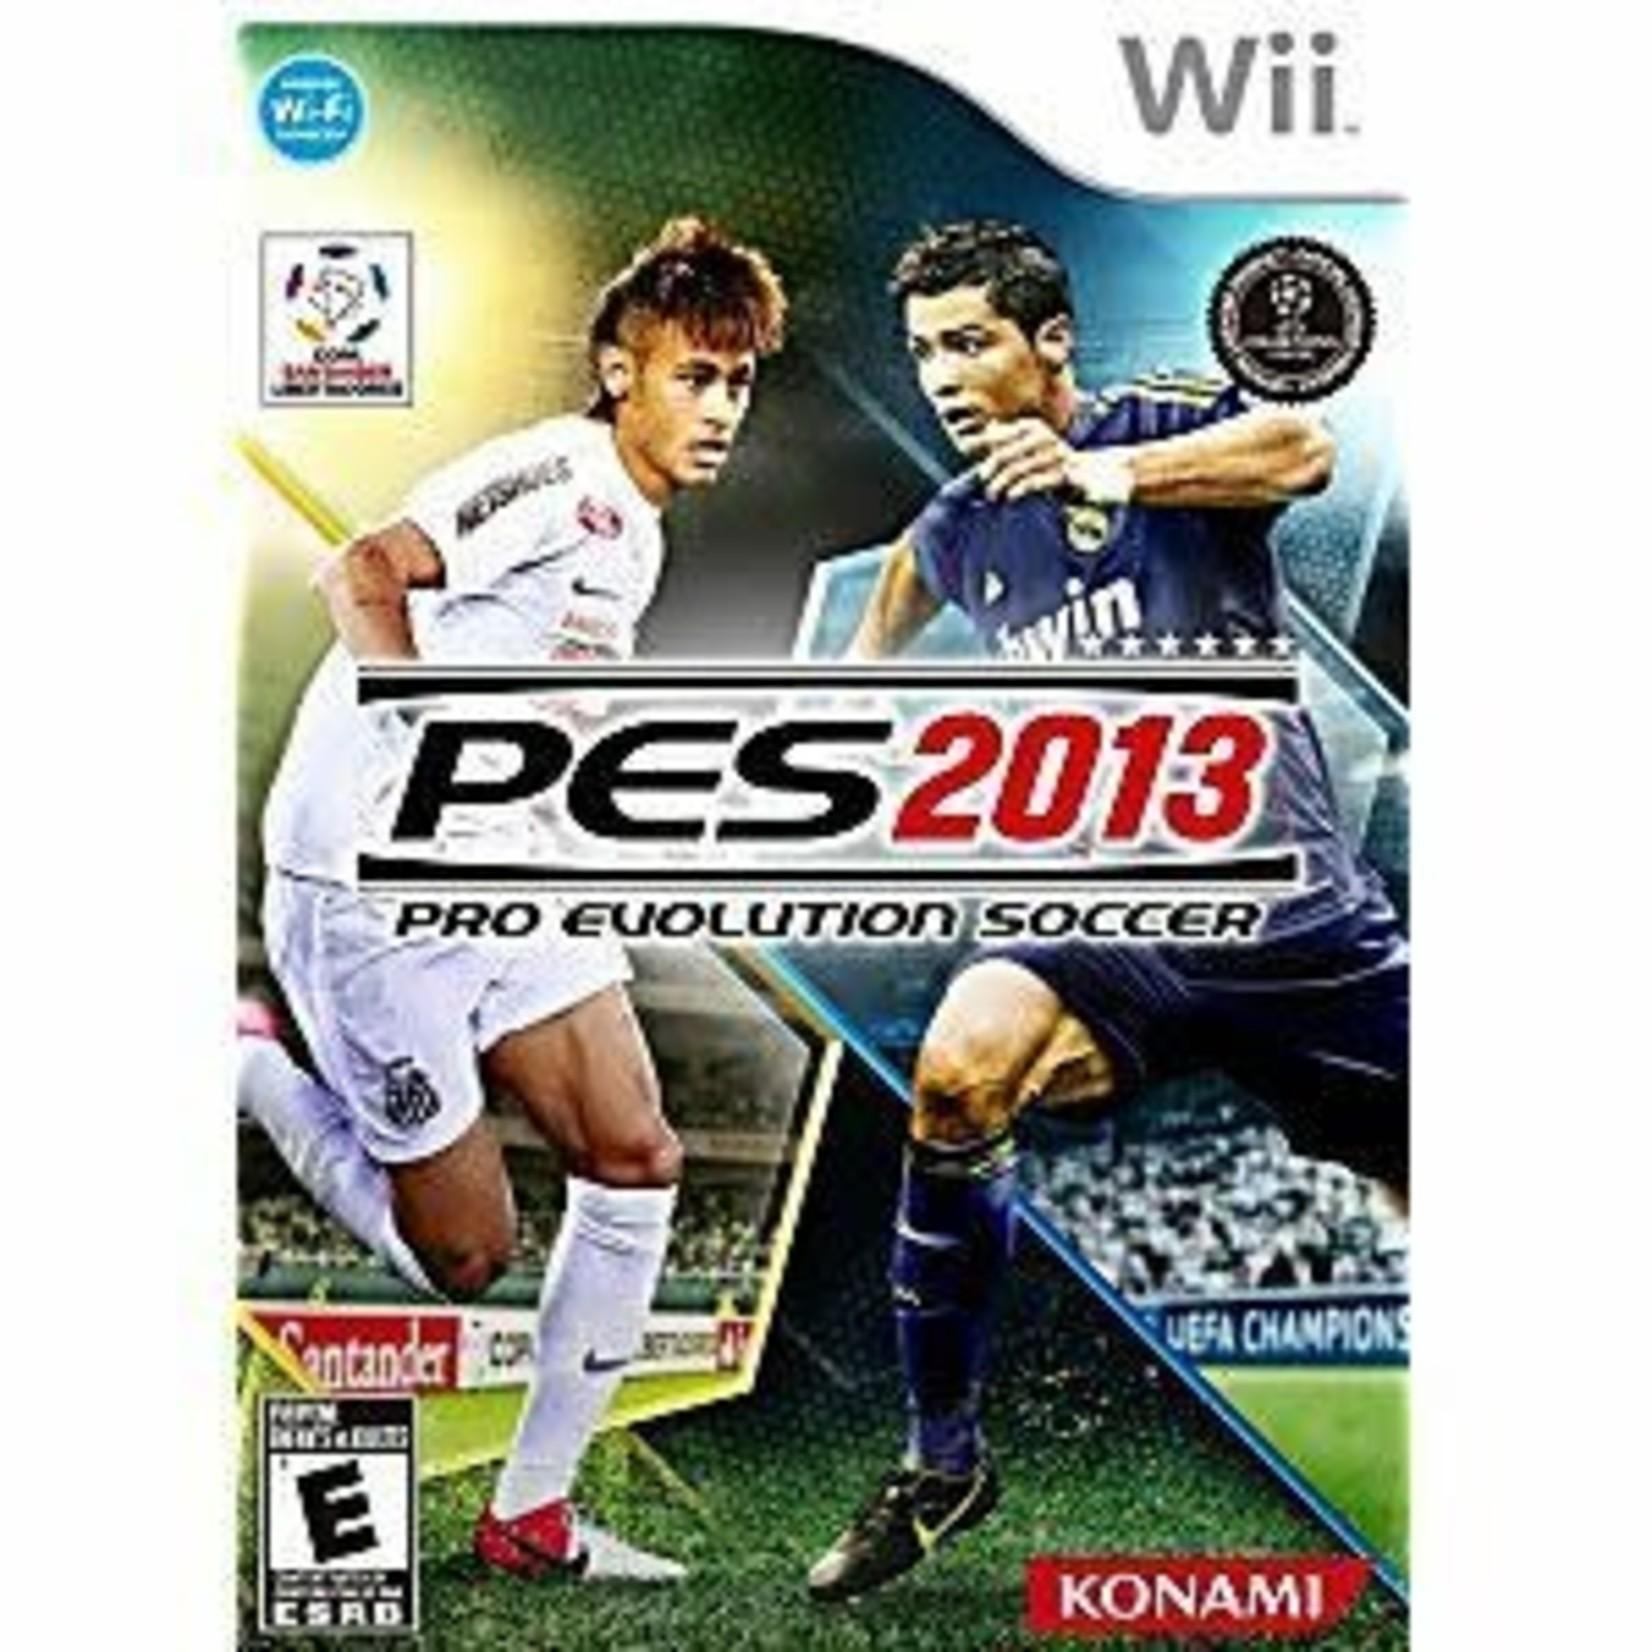 wiiusd-Pro Evolution Soccer 2013